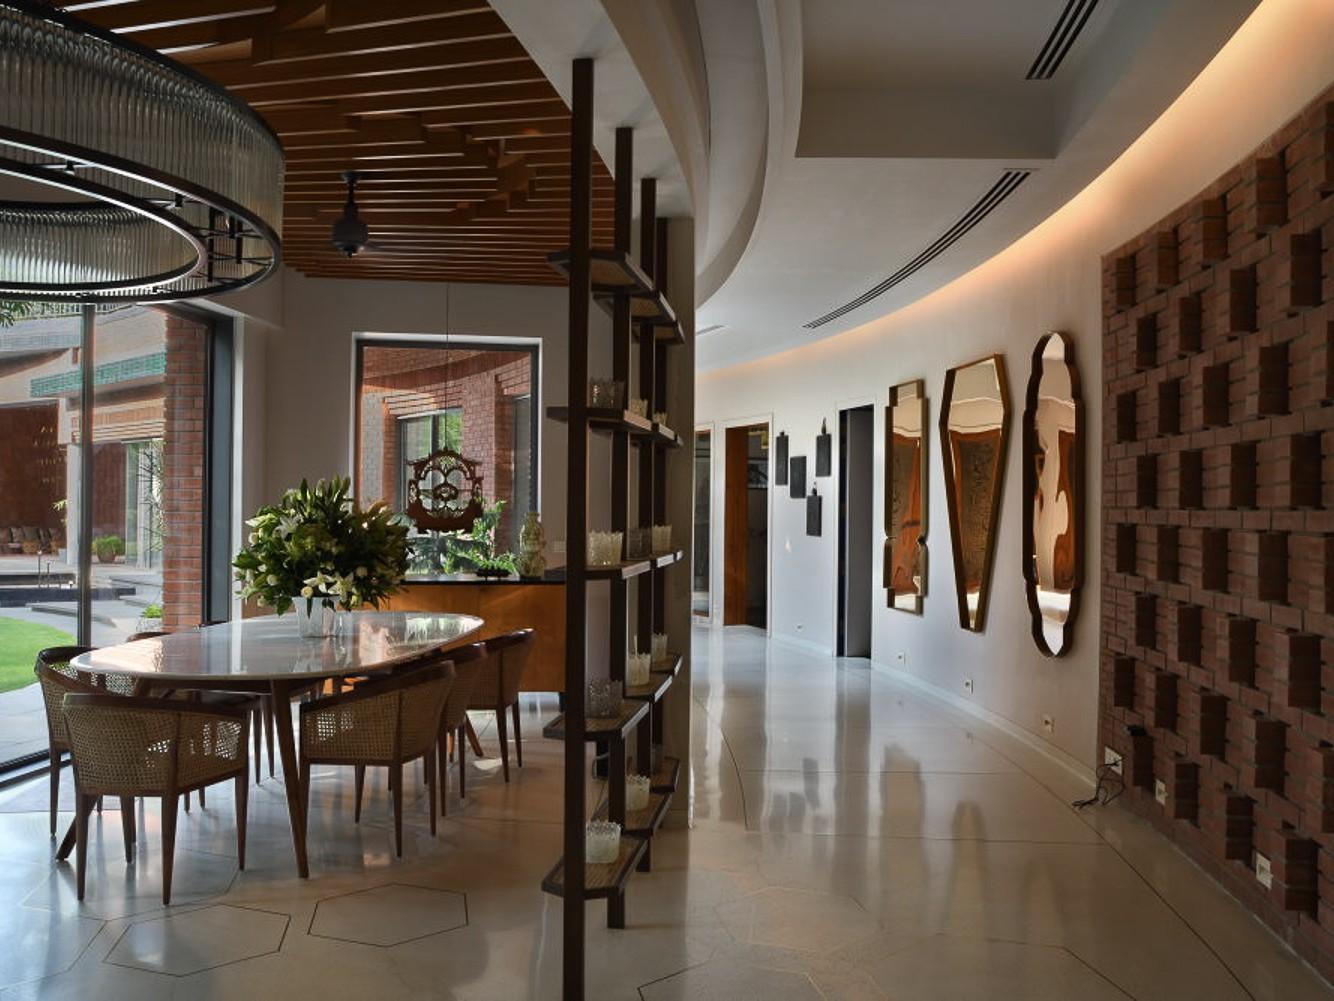 delhi family retreat farm house design hallway